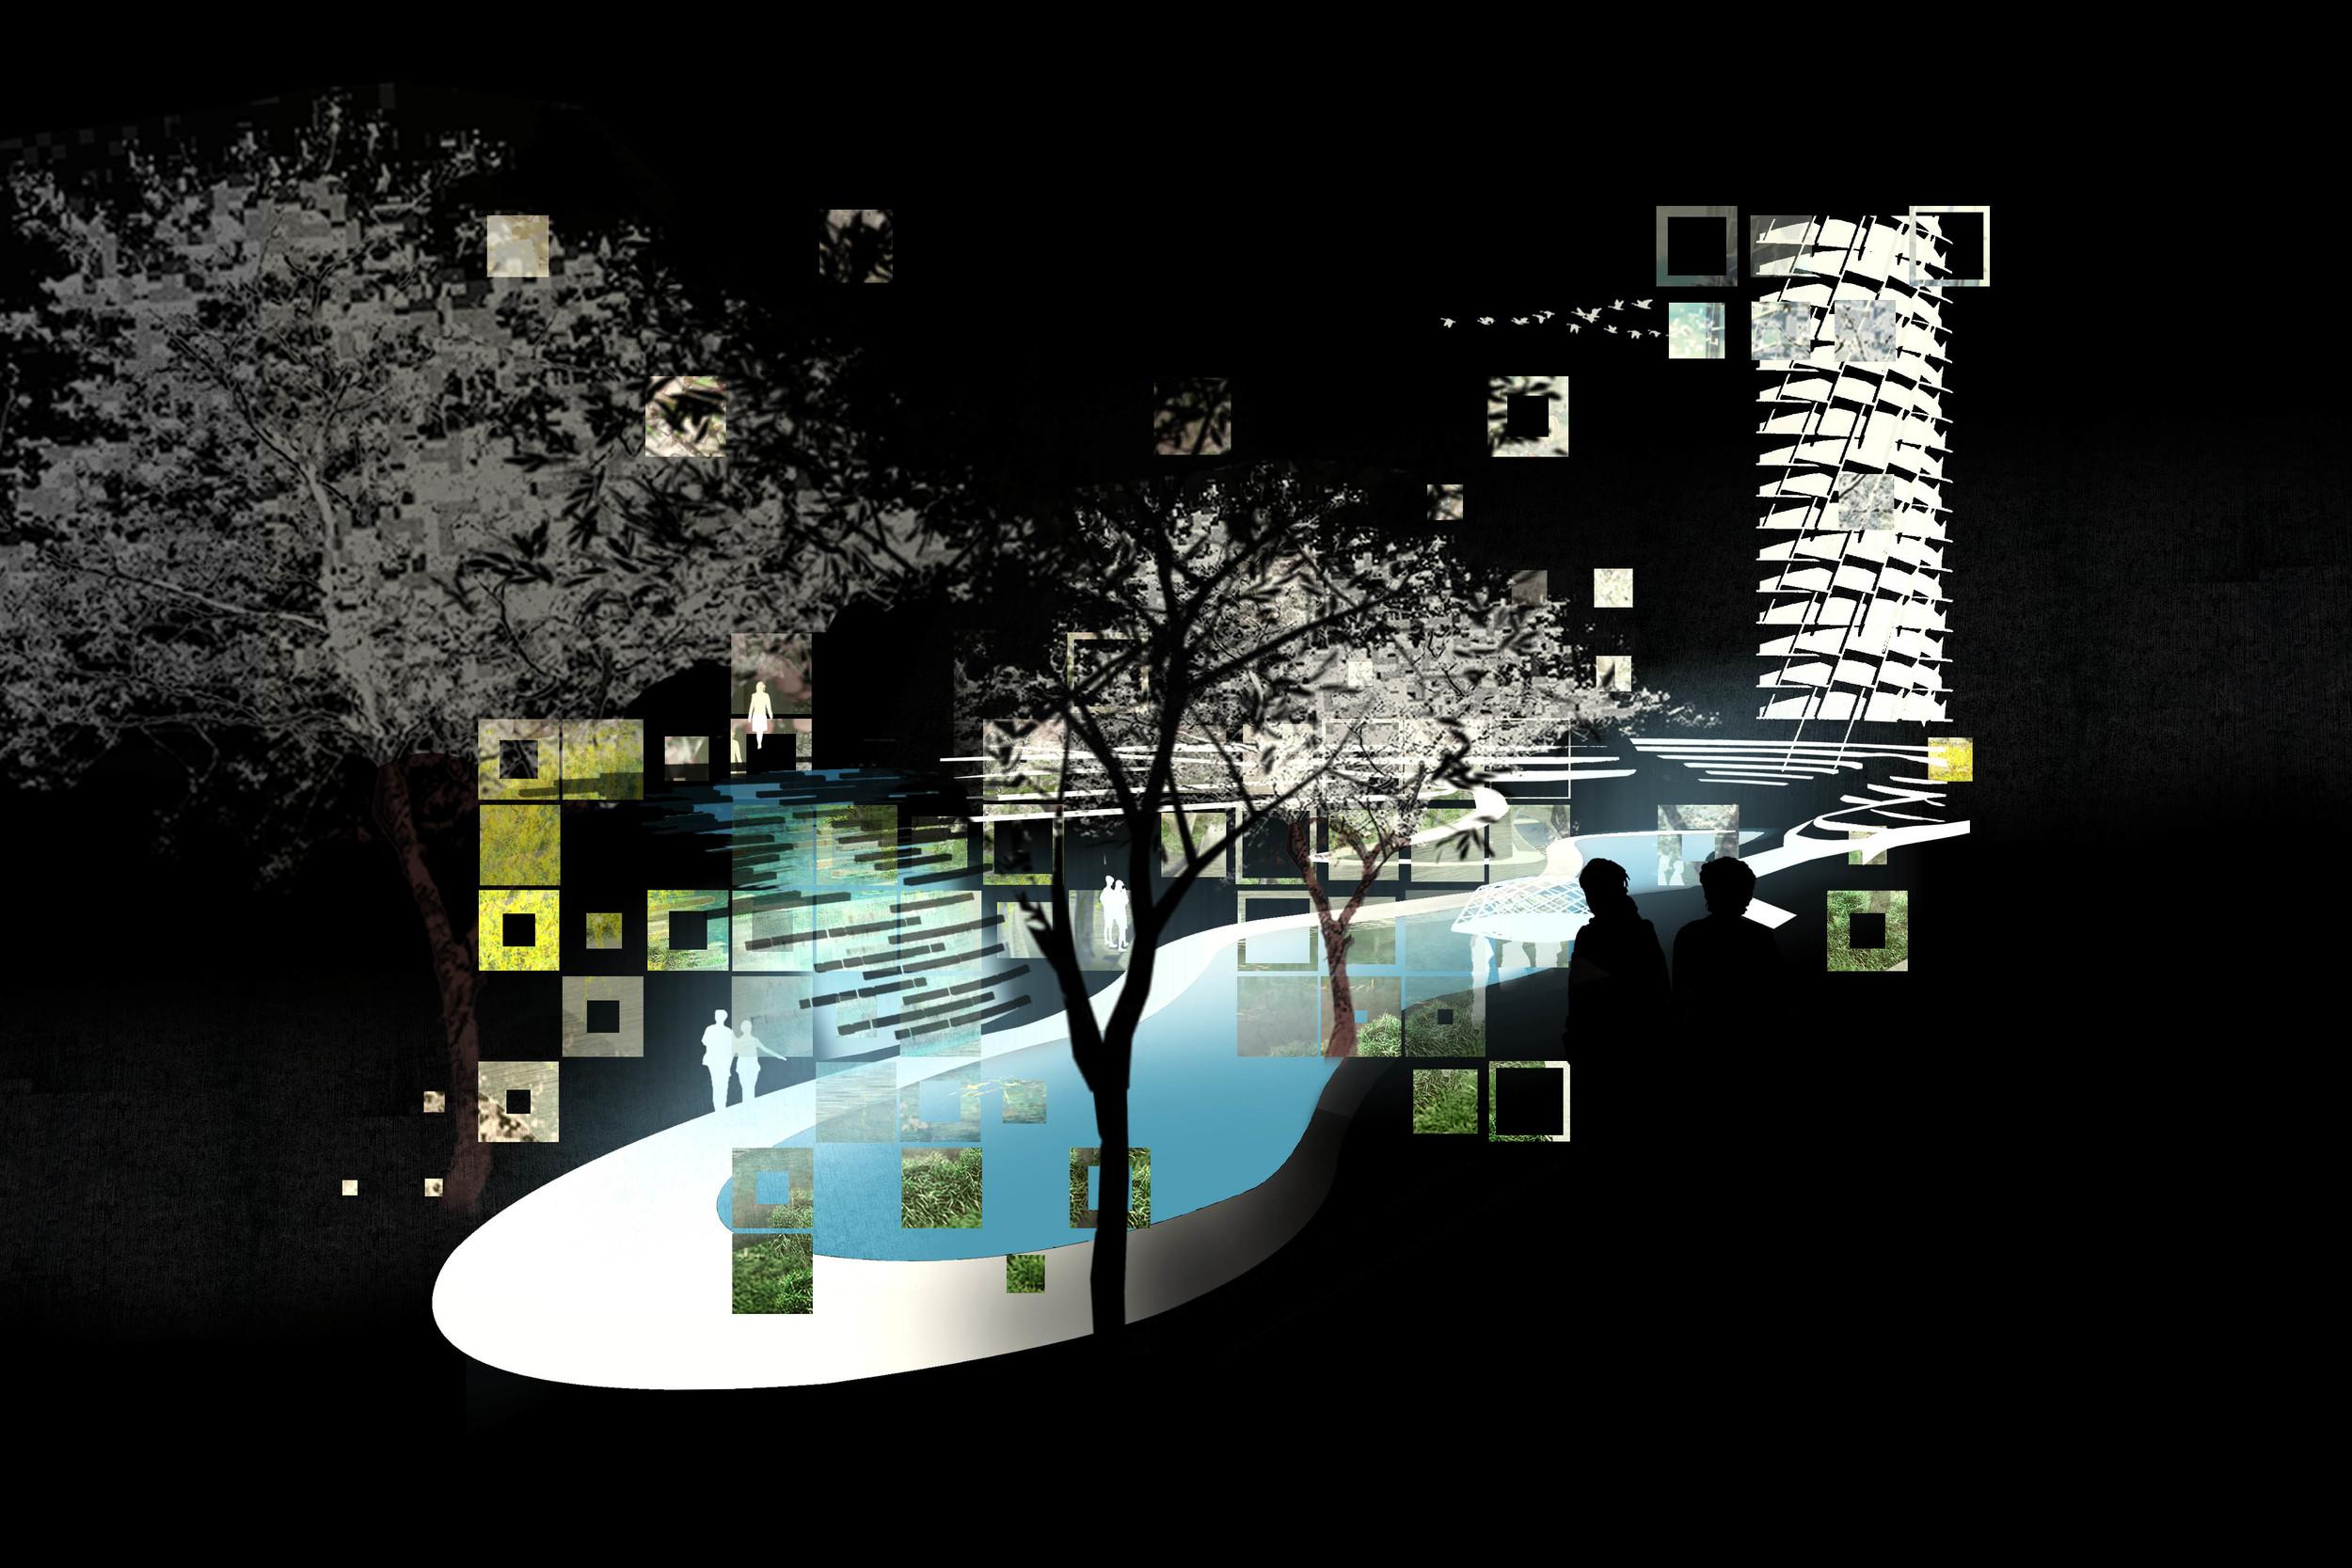 BA_tongshanjie_diagram.jpg